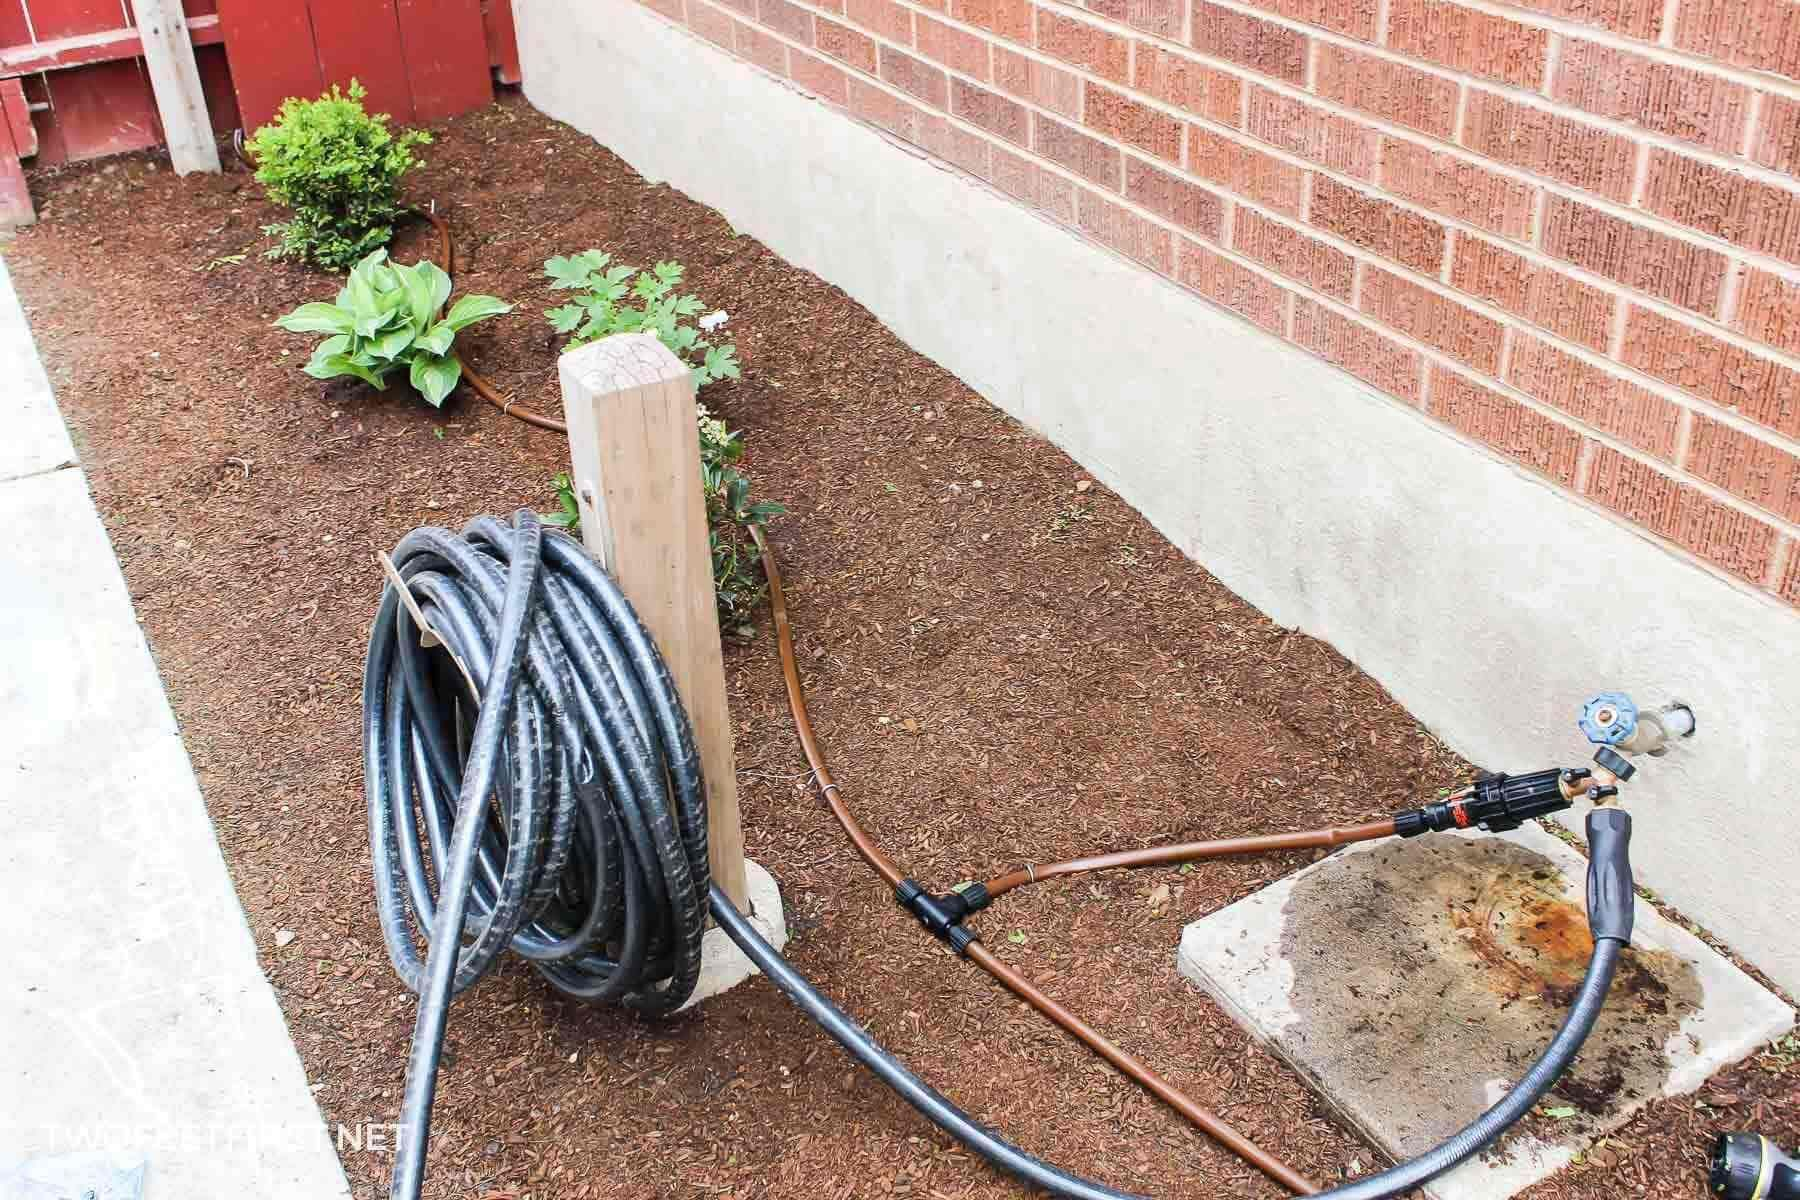 DIY Drip Irrigation System Drip watering system, Drip